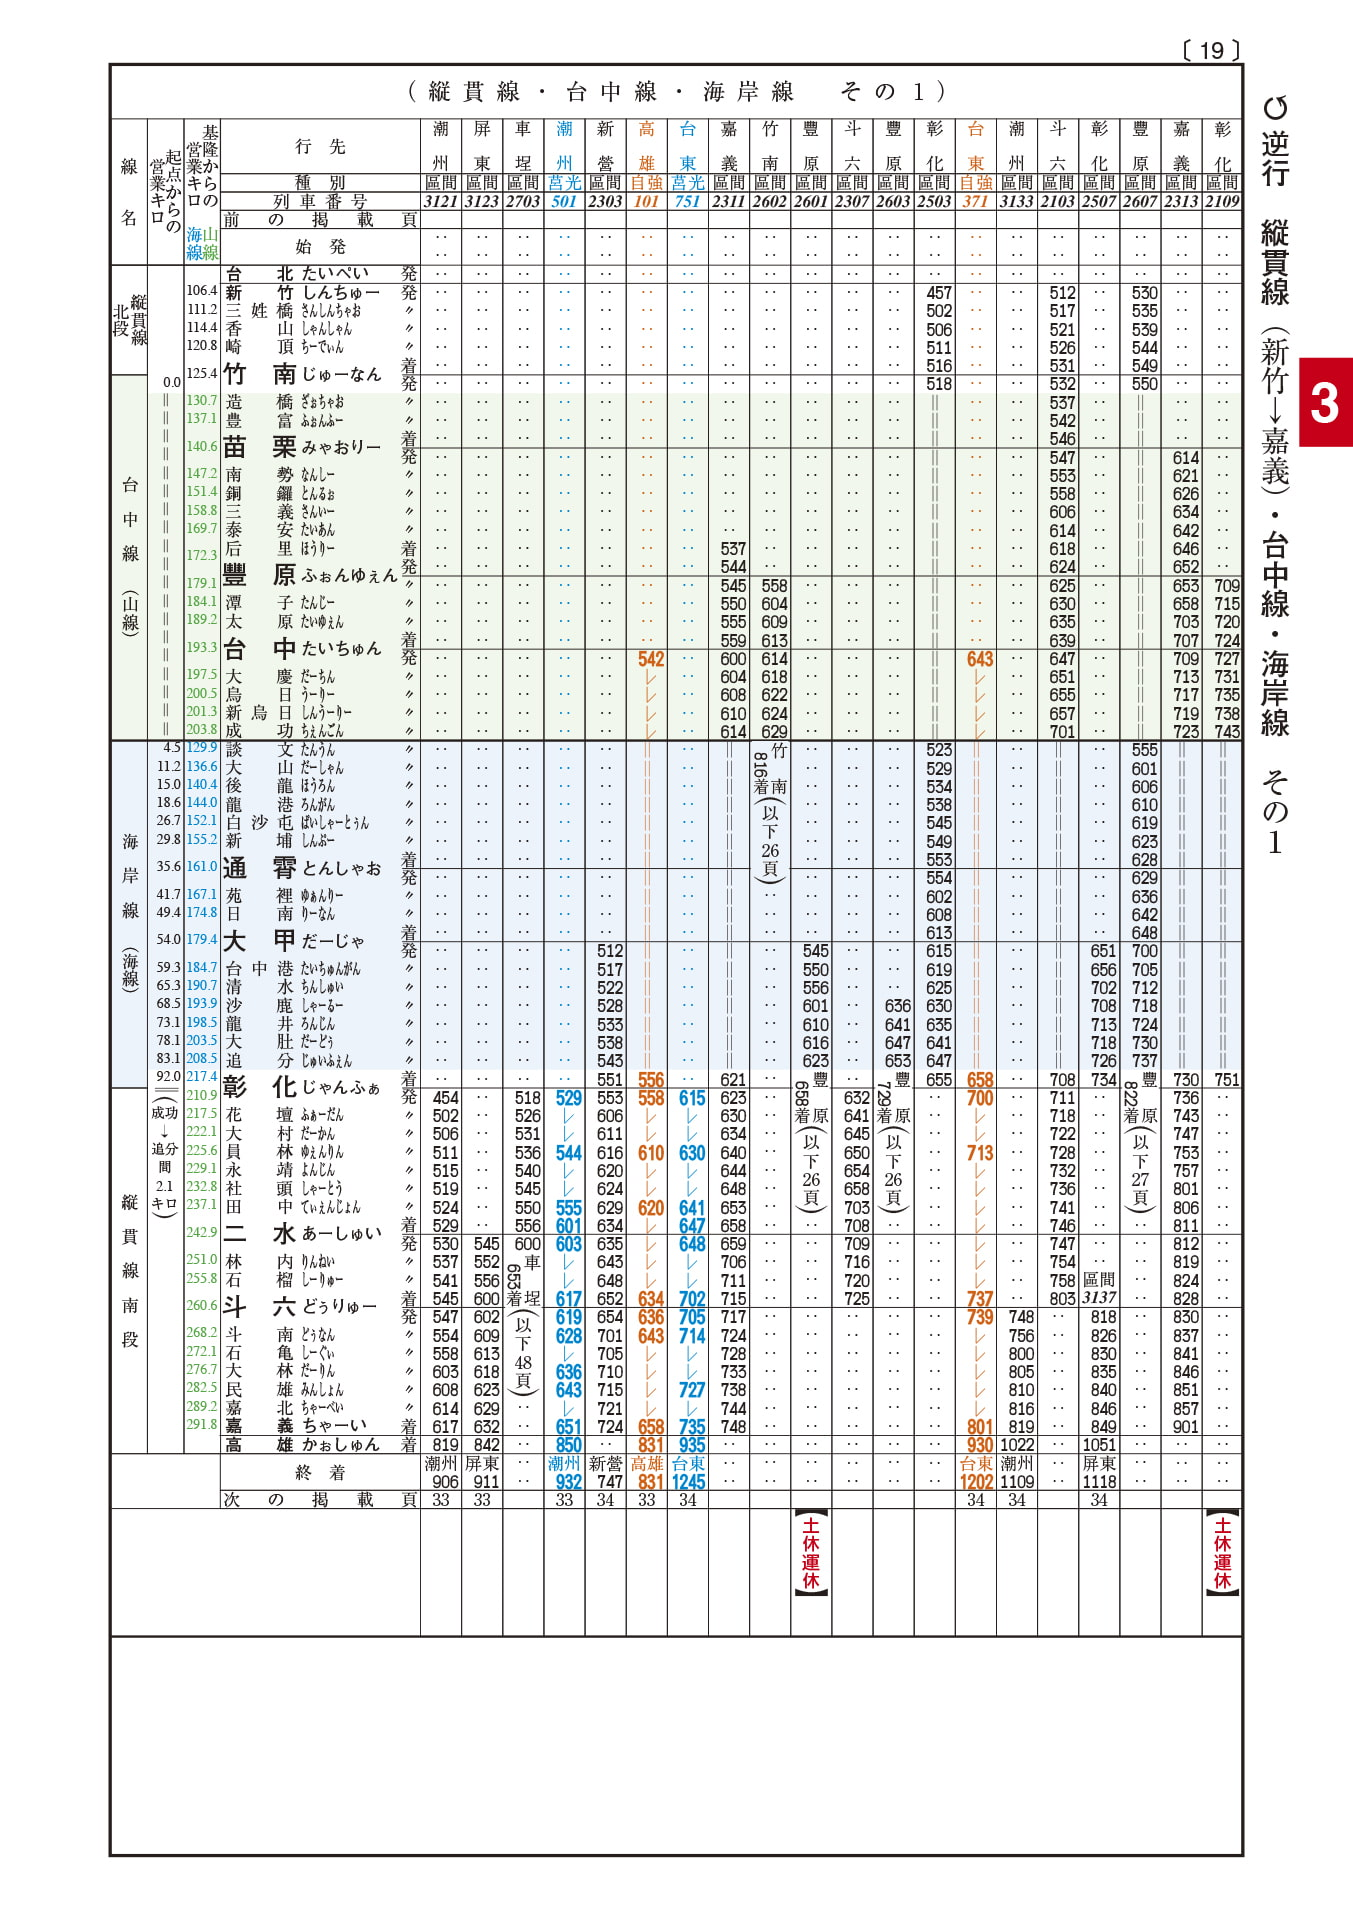 ニュー台湾時刻表2017年1月号(2017年1月5日台鐵ダイヤ修正反映版)